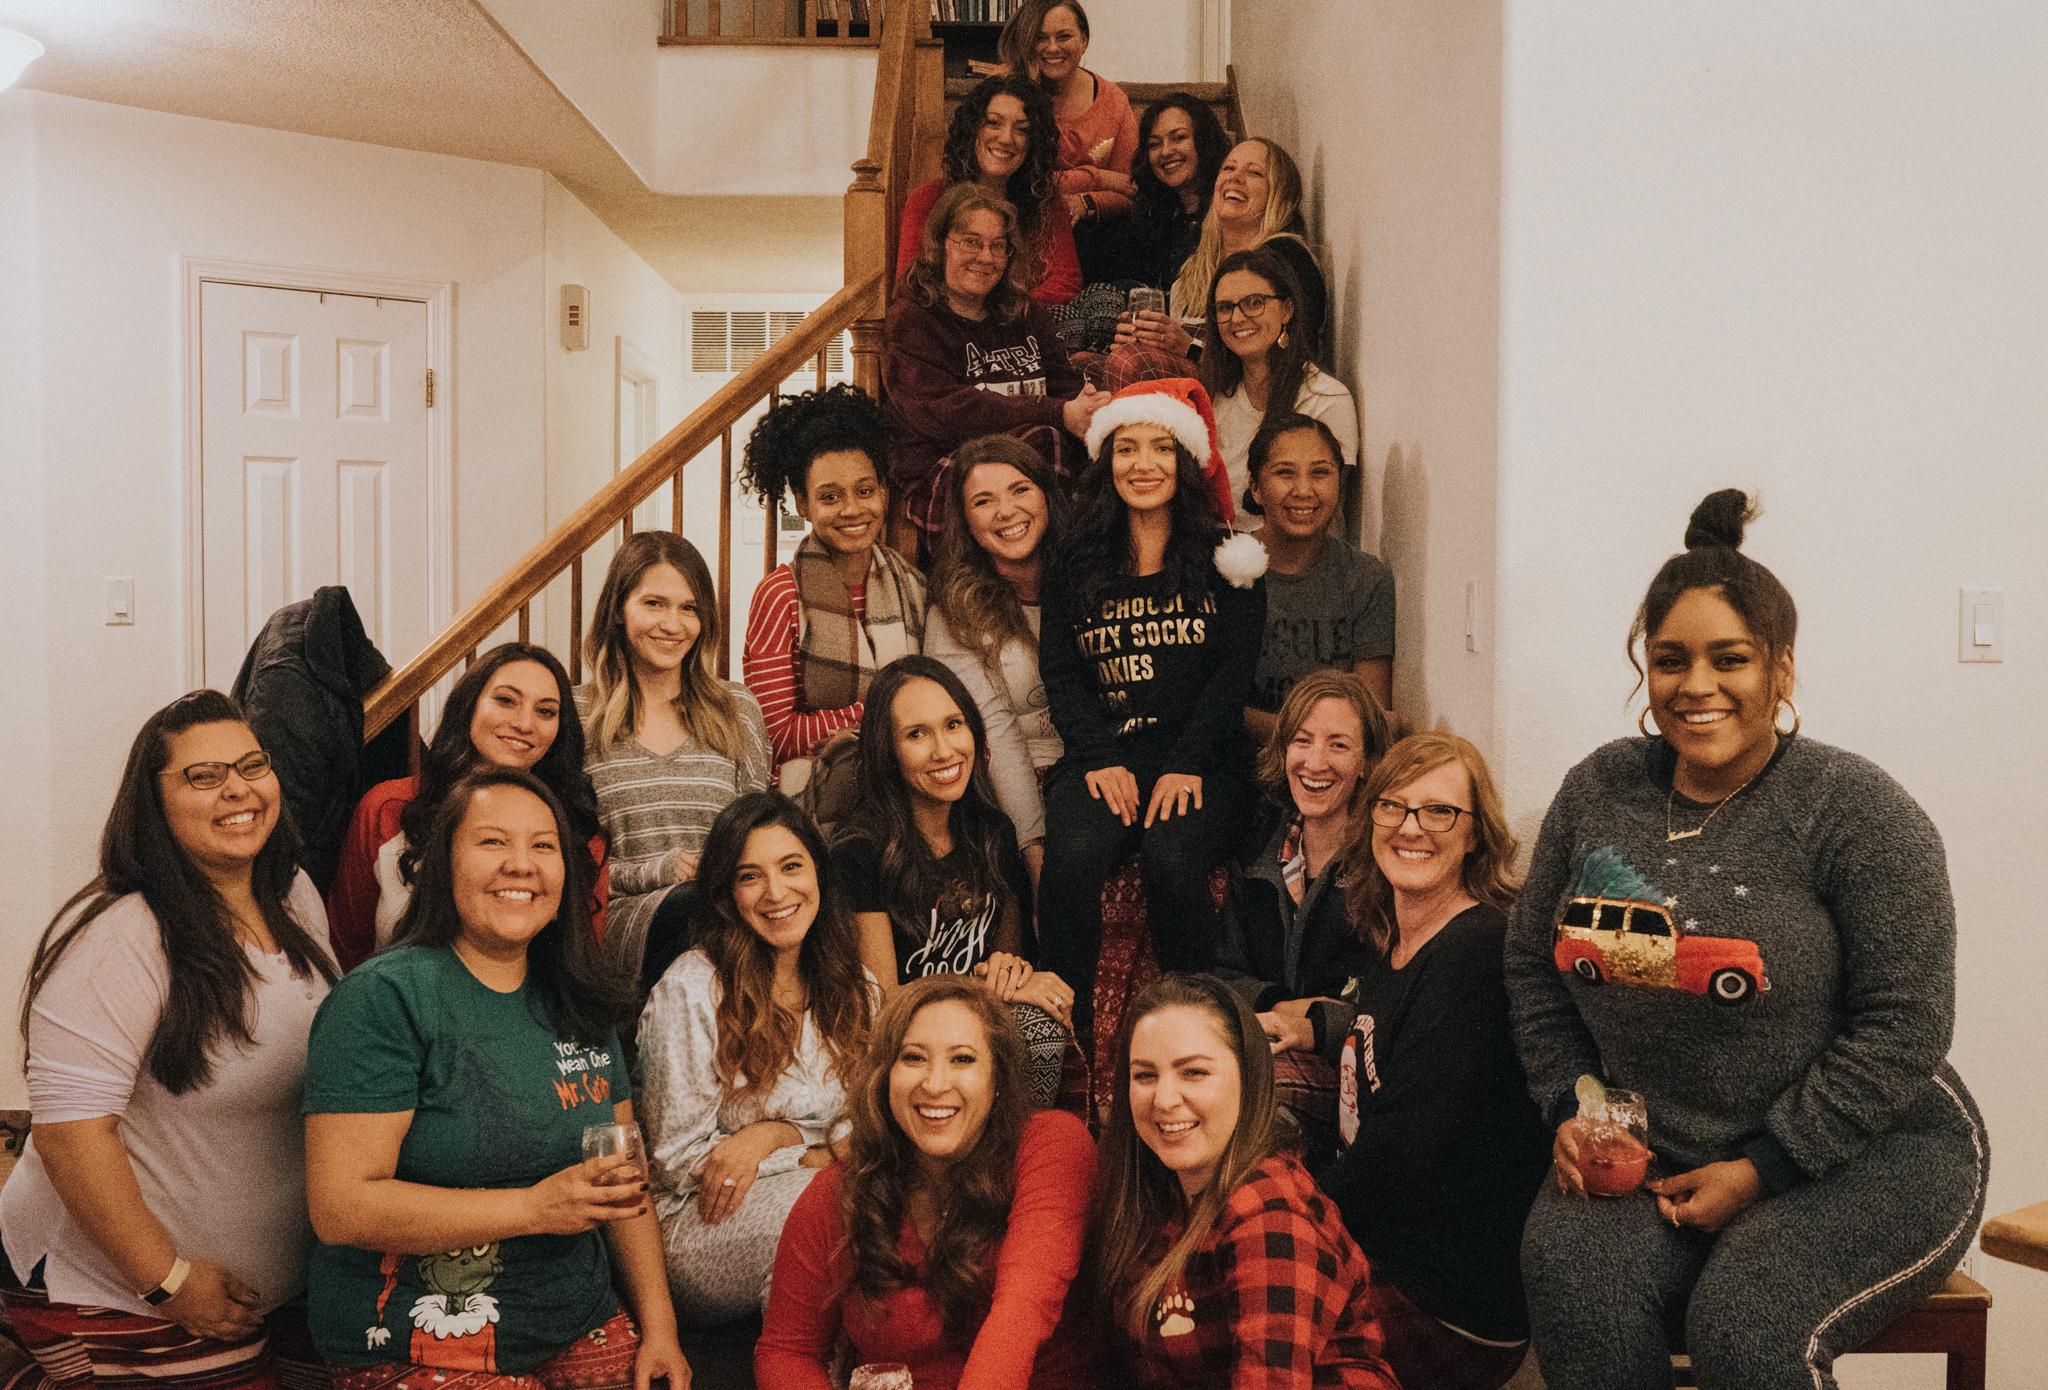 Favorite Things Party, Albuquerque Moms Blog